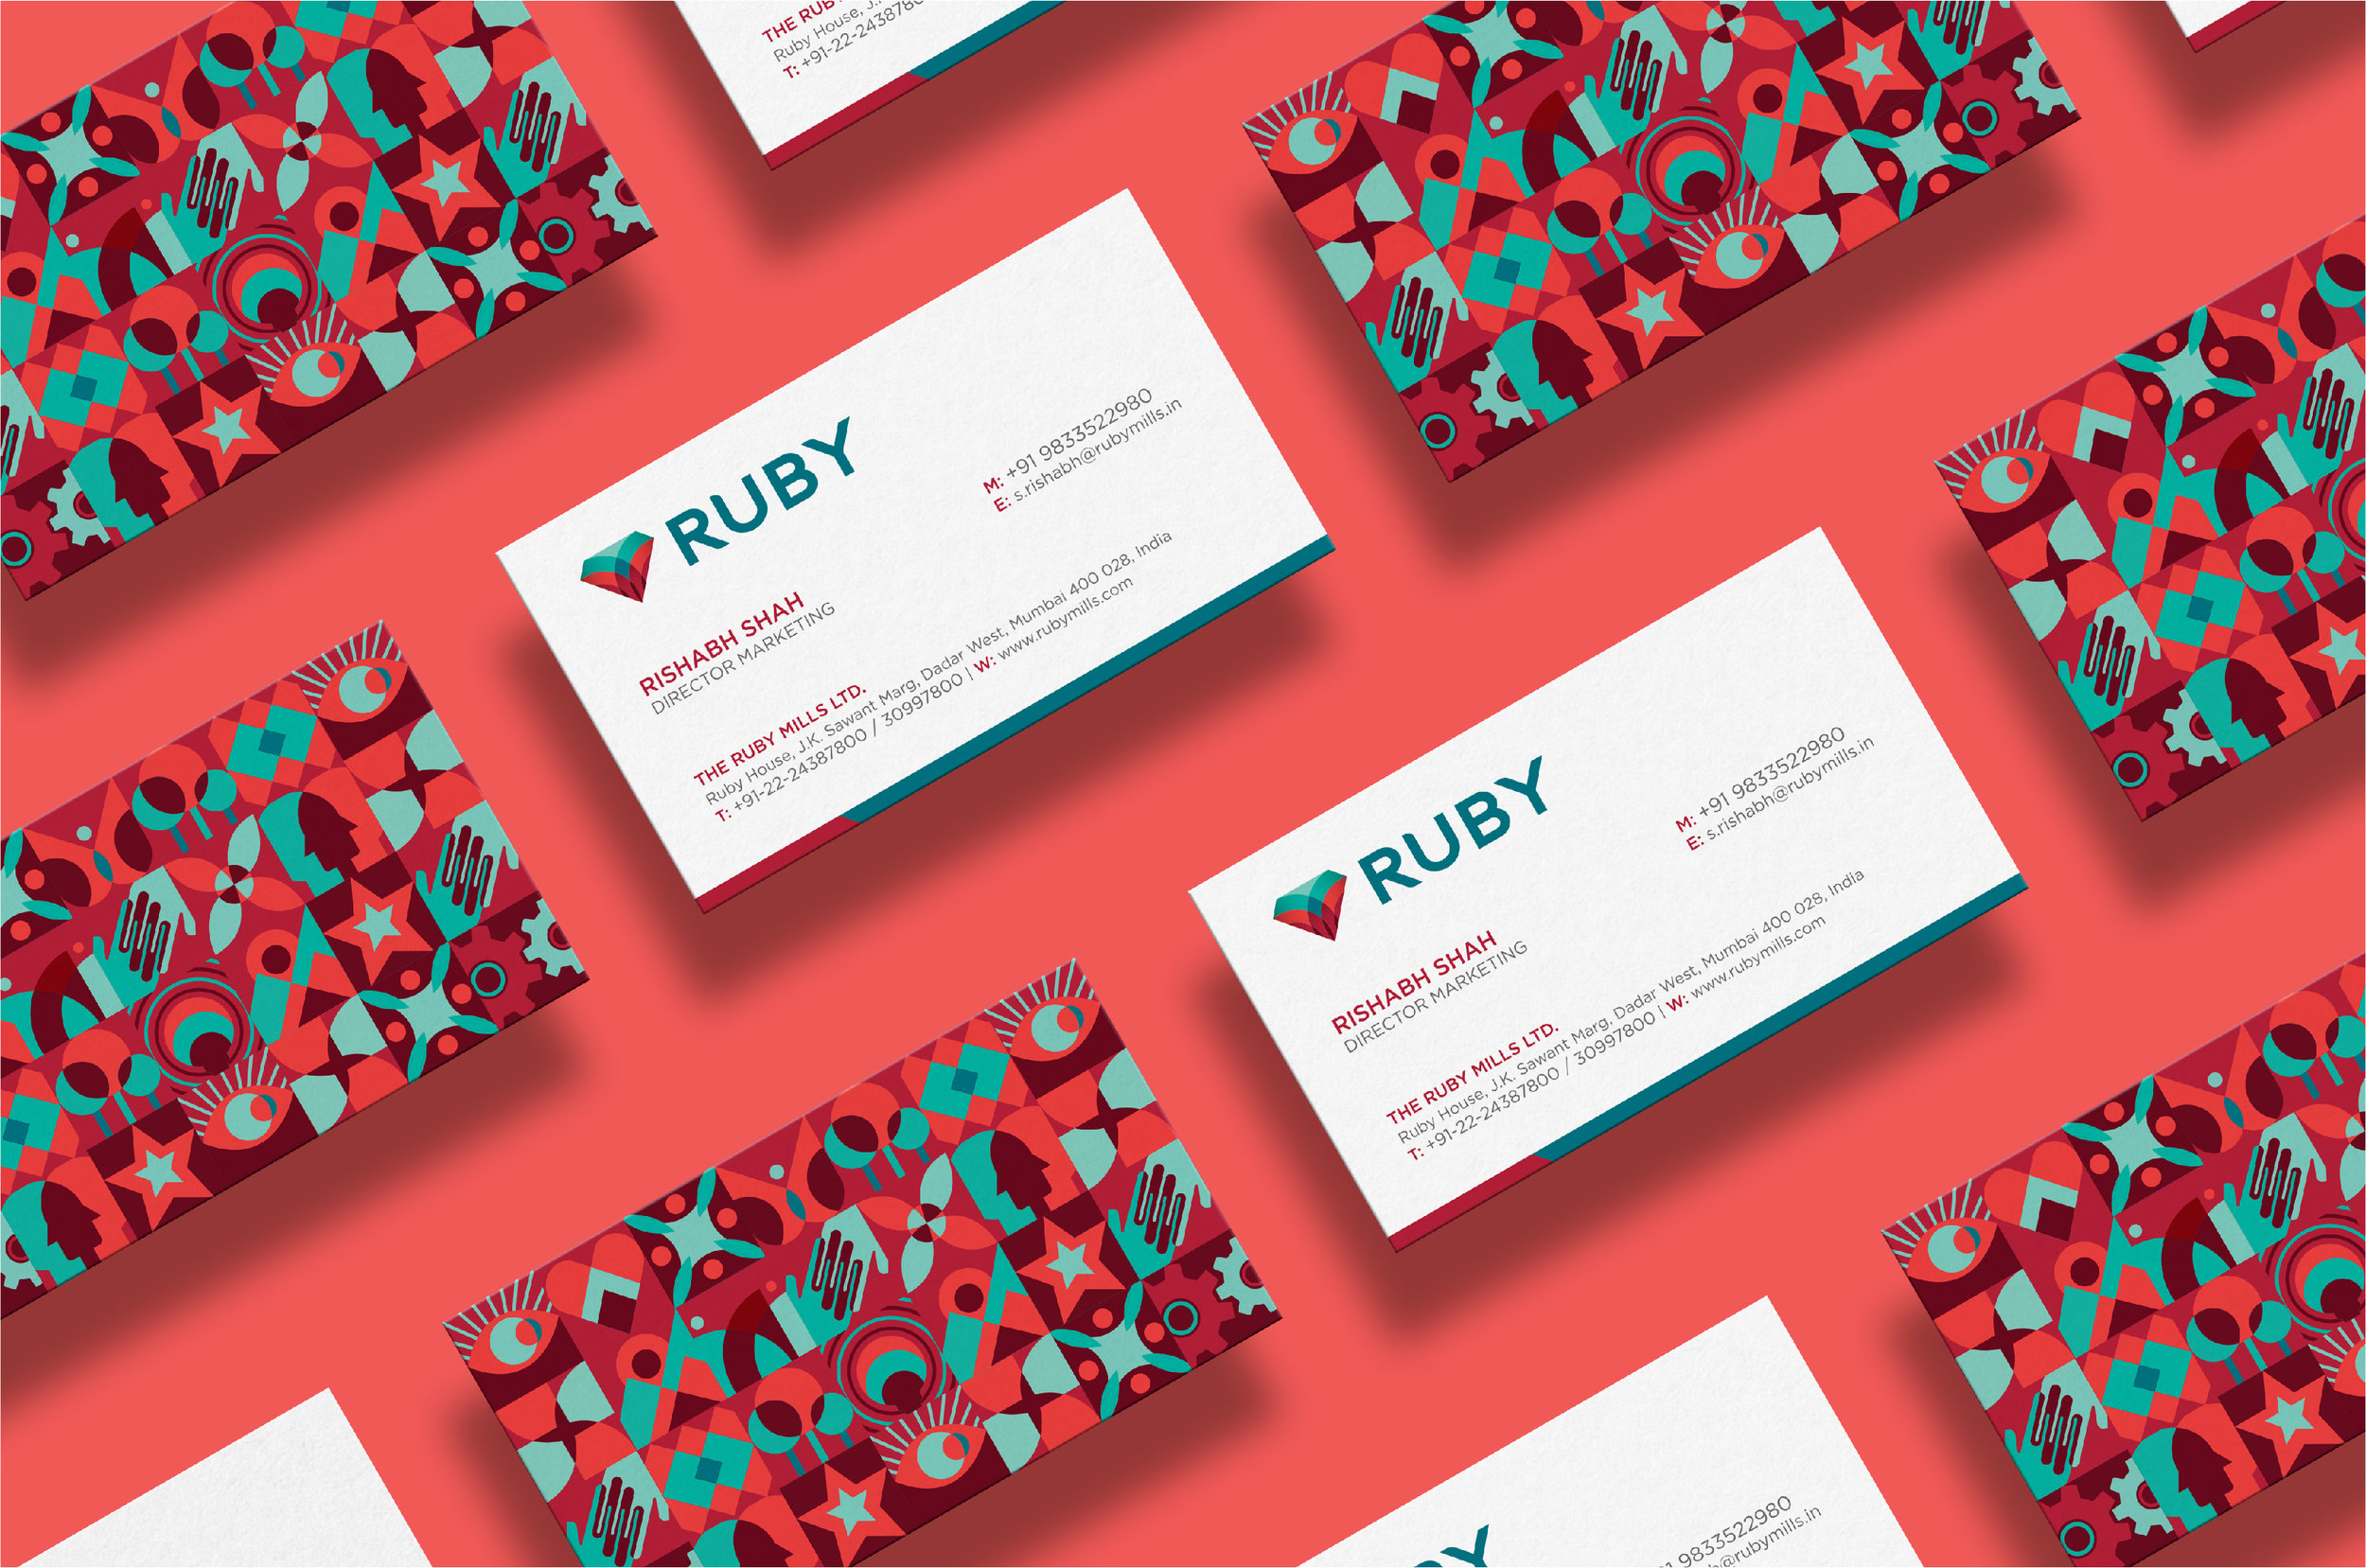 Ruby Mills_Branding Strategy, Communication Design_Elephant Design, Pune, Singapore_4.jpg